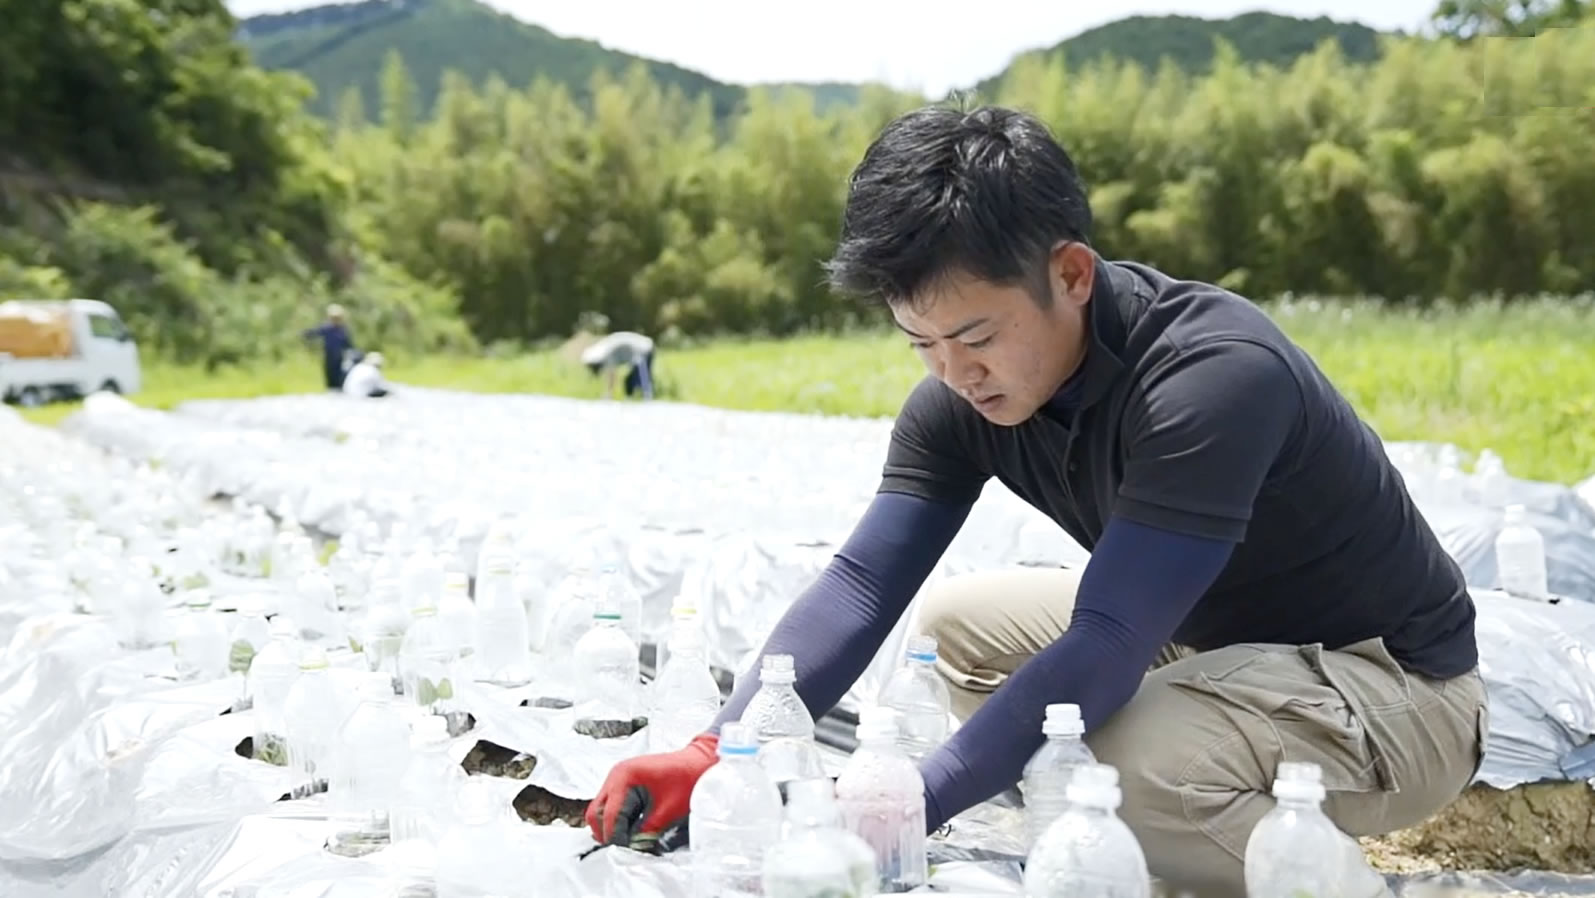 Ragri 日本の新しい形の農業を作り出す